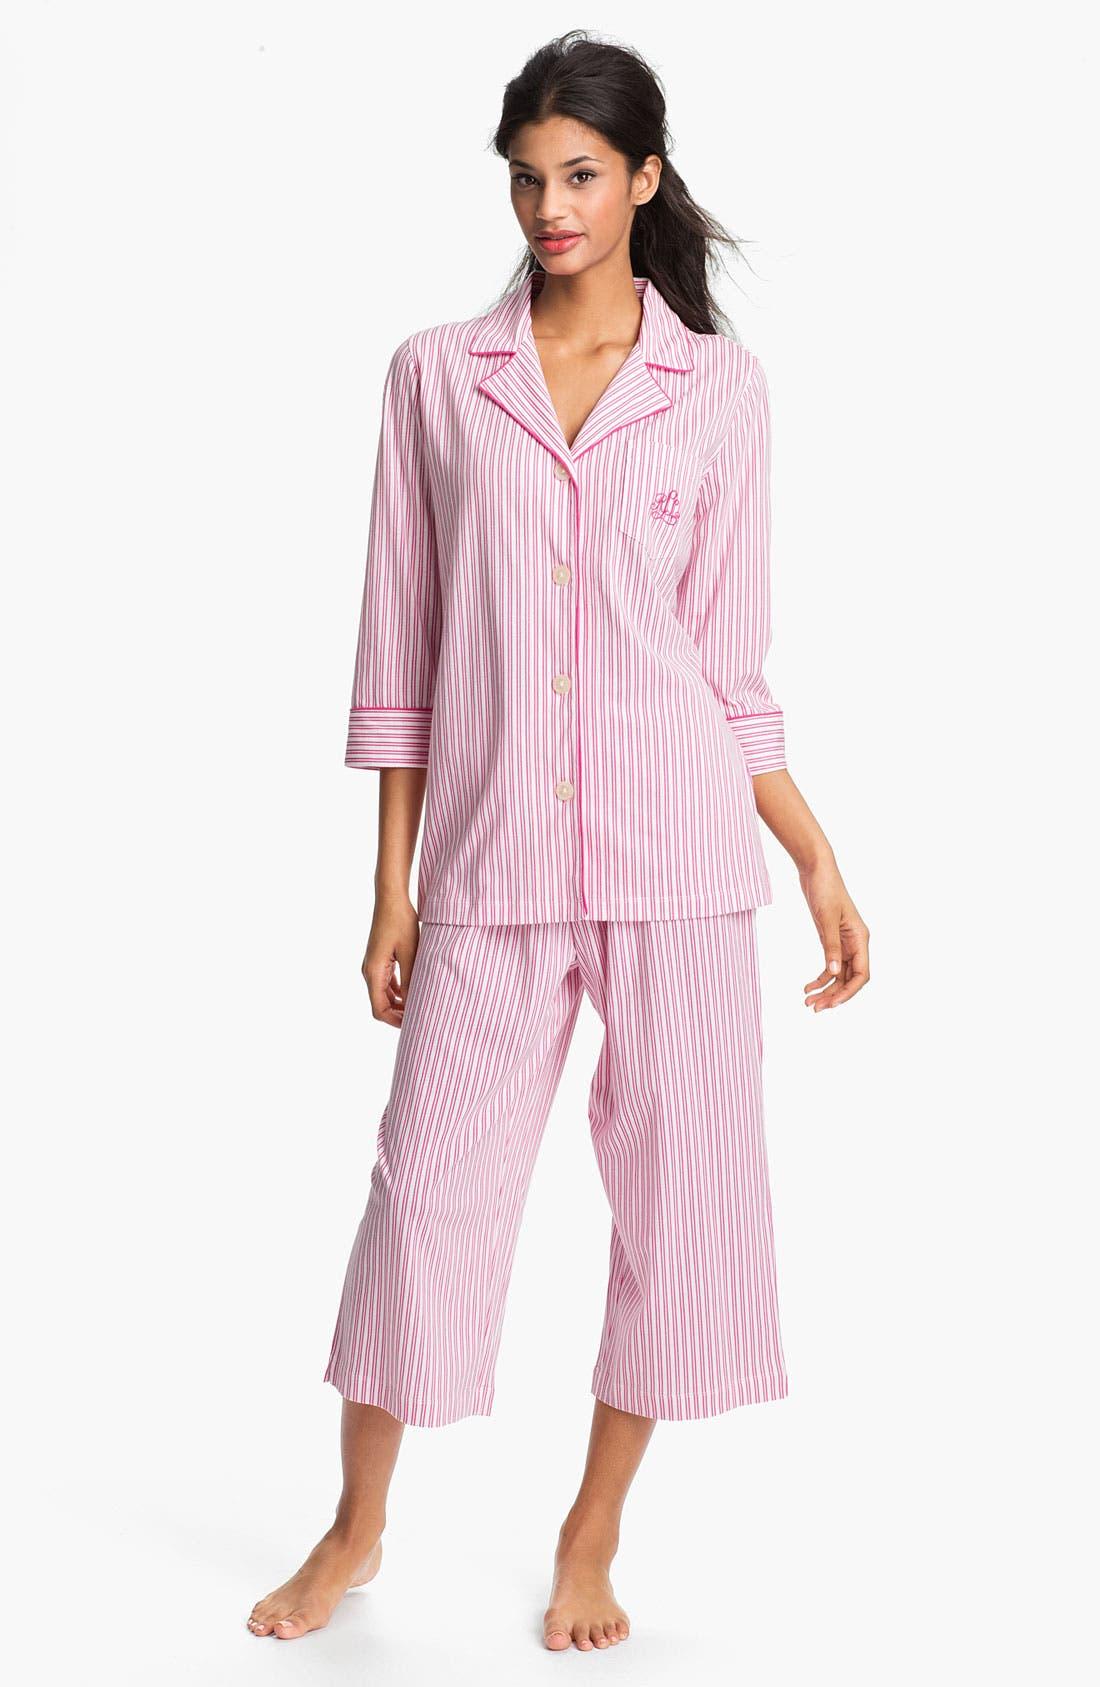 Alternate Image 1 Selected - Lauren Ralph Lauren Sleepwear Cropped Stripe Pajamas